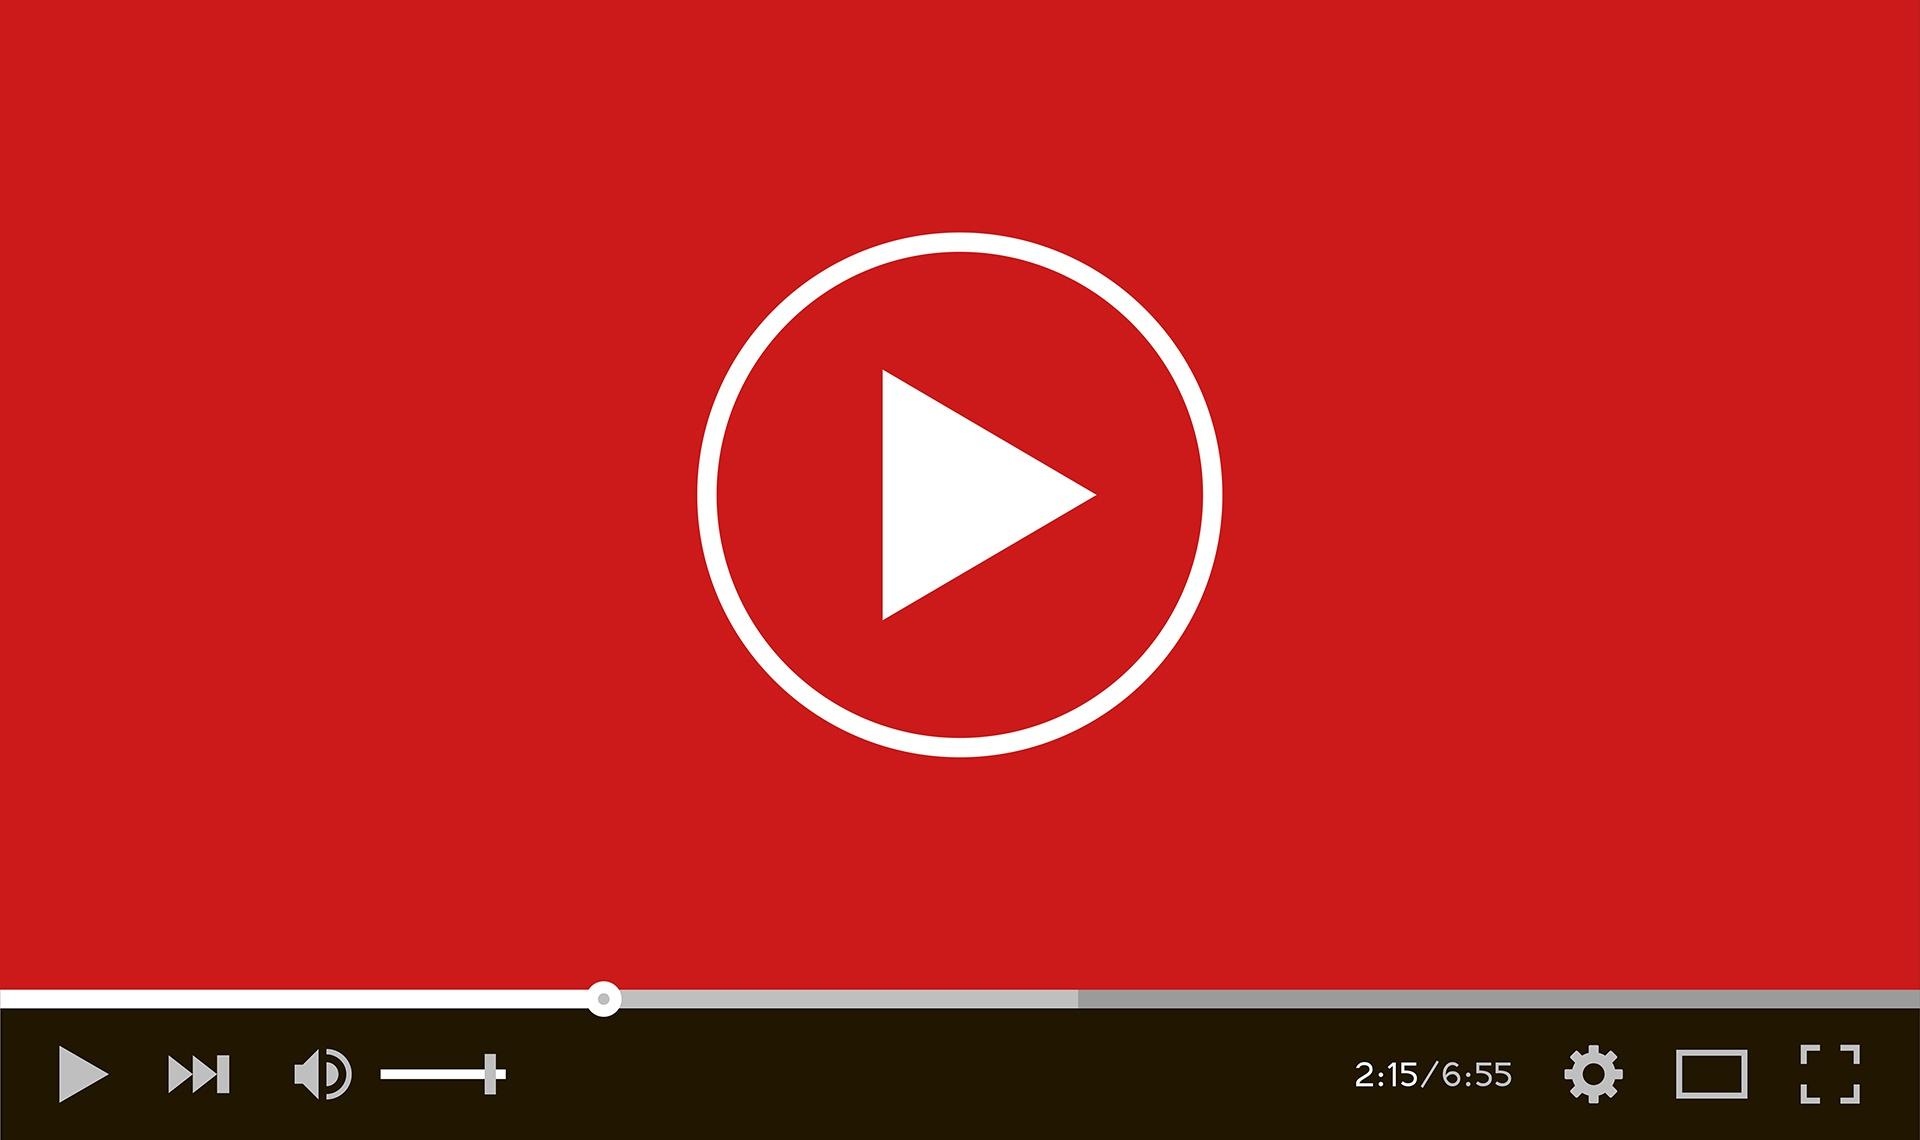 Where Should I Host My Marketing Videos?